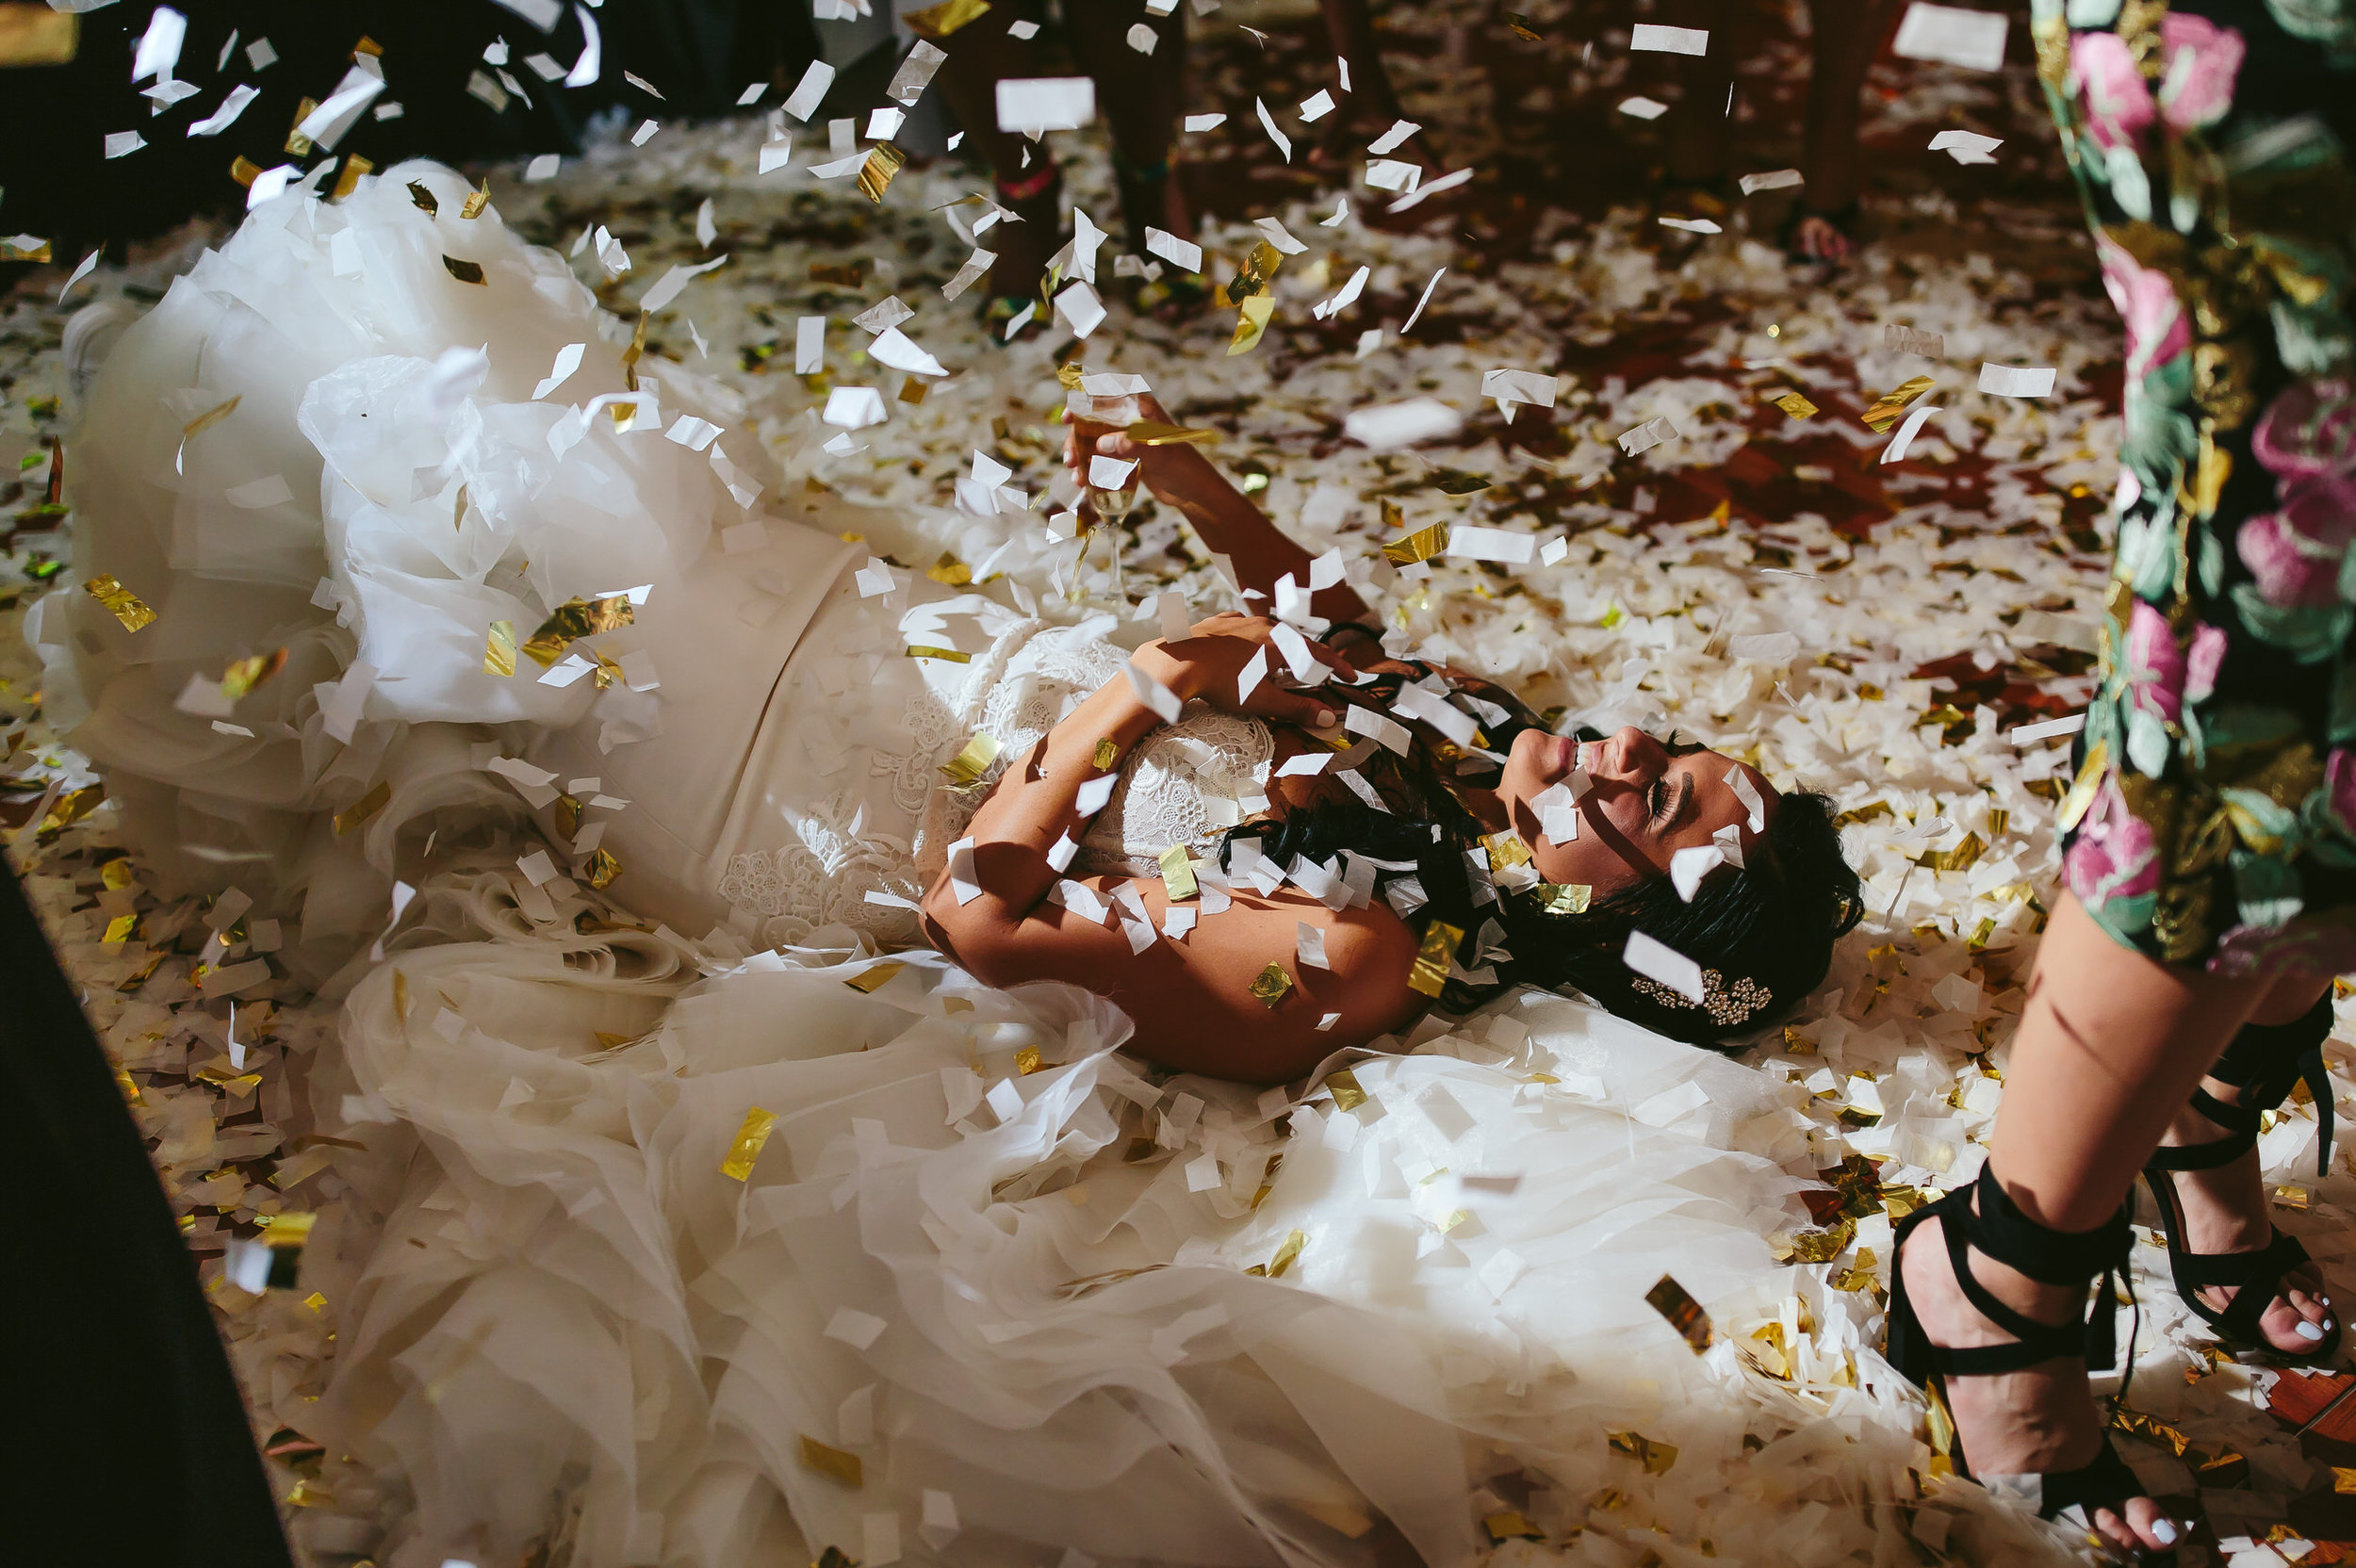 miami-biltmore-wedding-photographer-reception-party-45.jpg